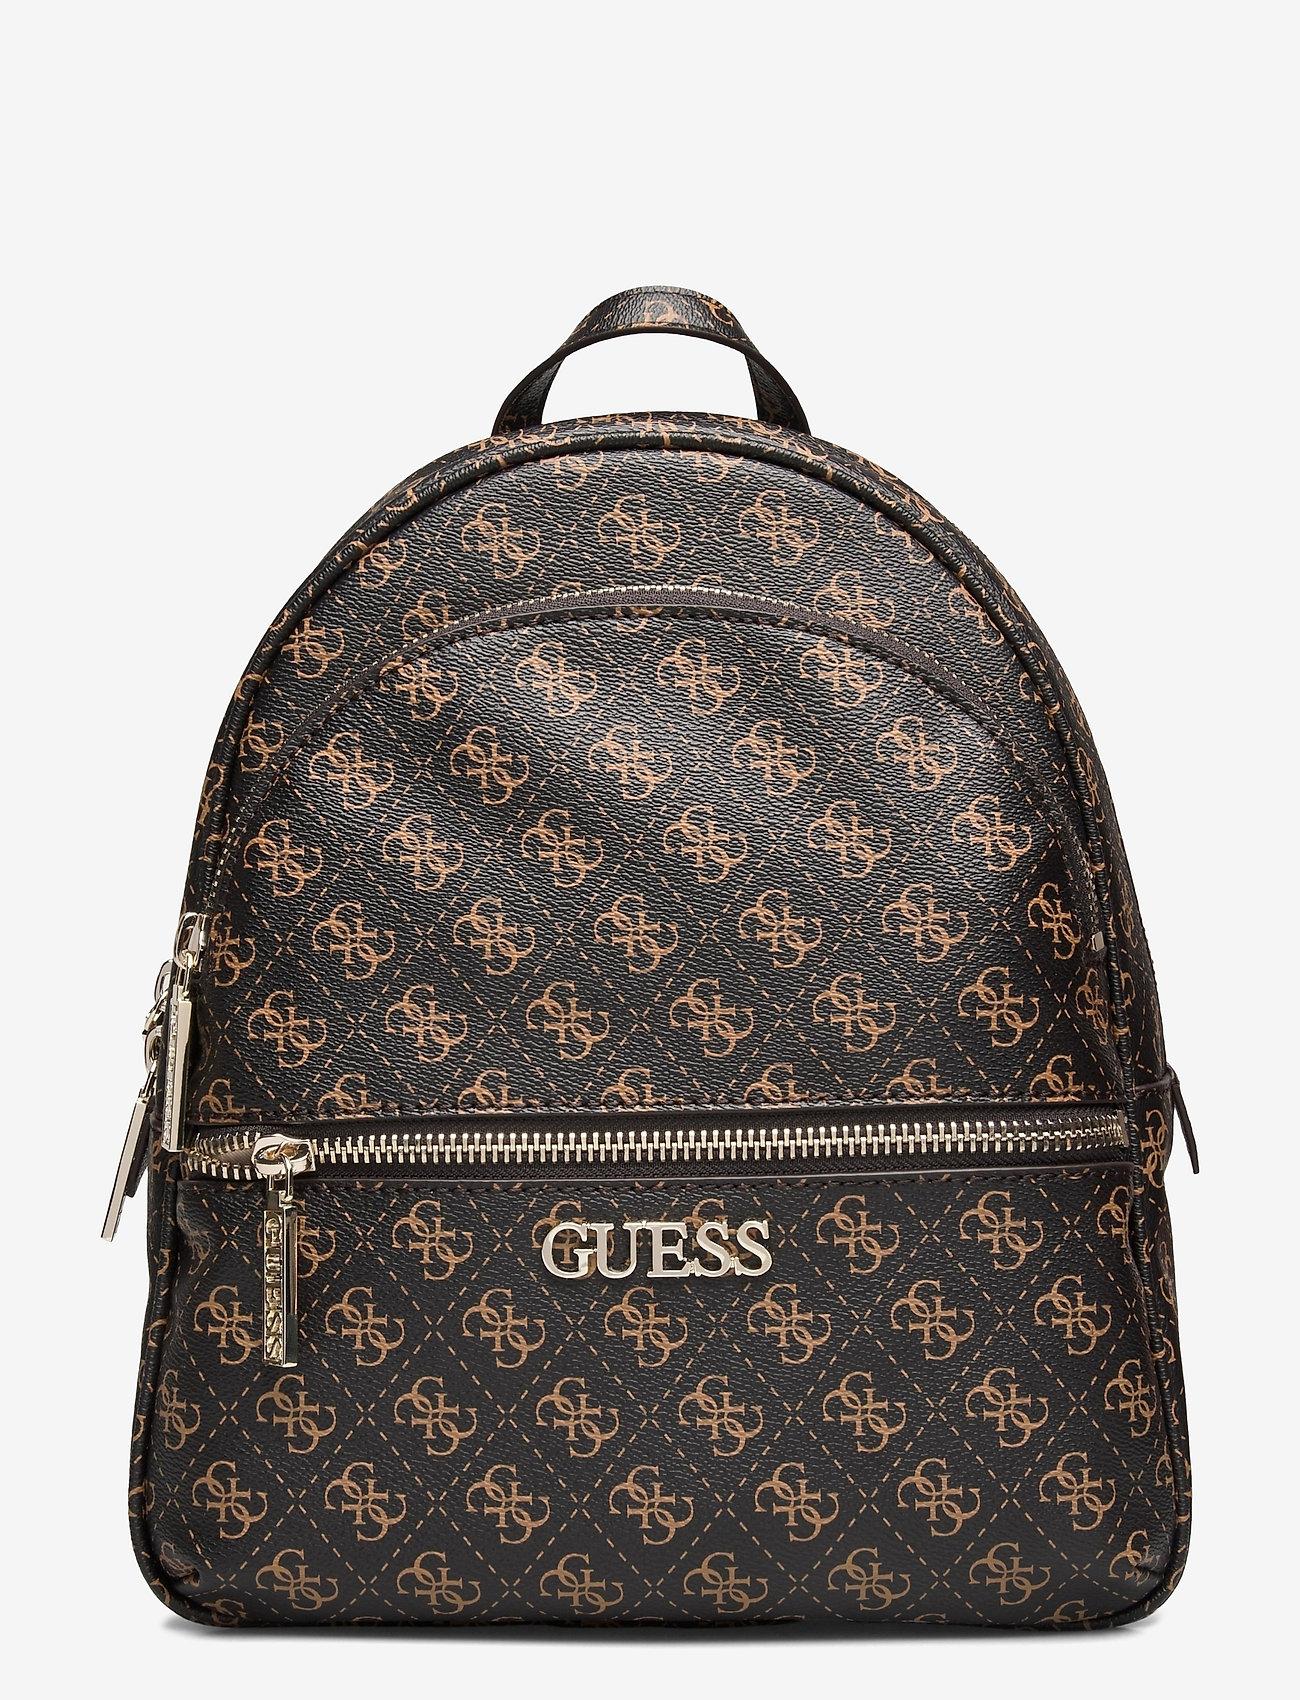 GUESS - MANHATTAN BACKPACK - sacs á dos - brown - 0